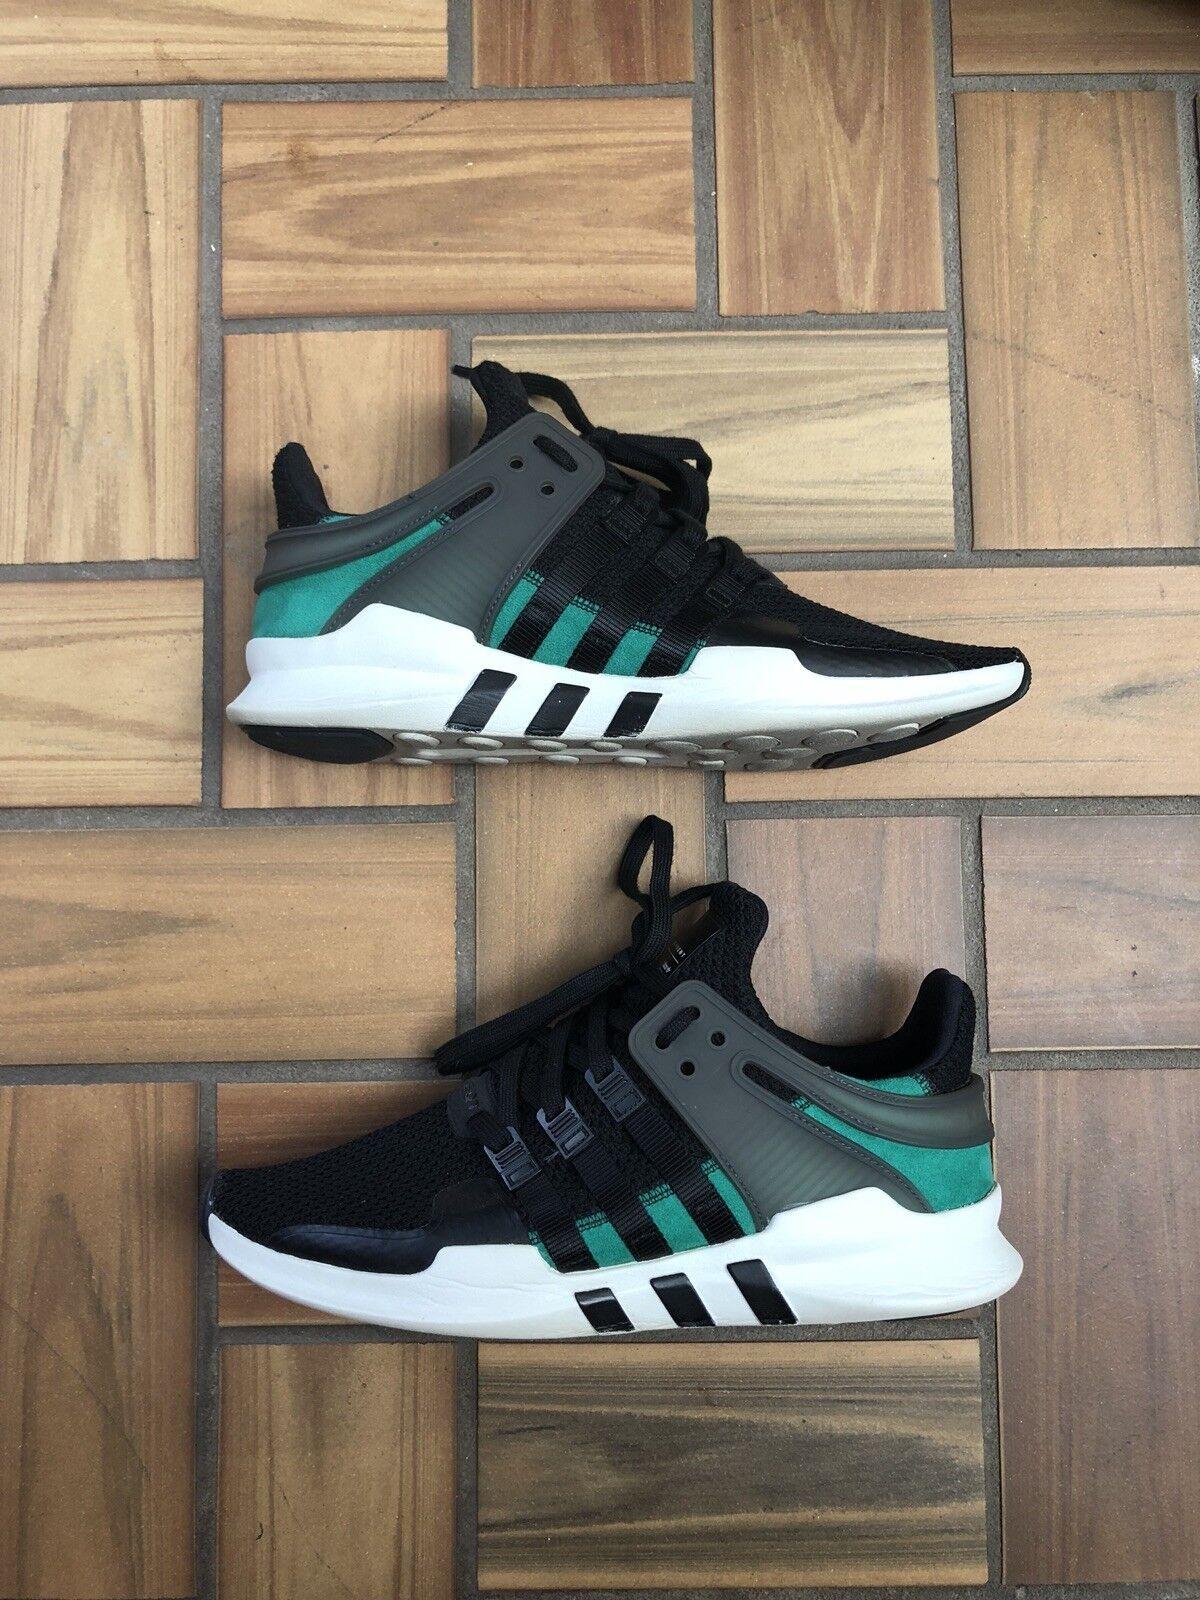 Adidas Originals EQT Support ADV 91 - 16 / Mens 10.5 / Black Sub Green White